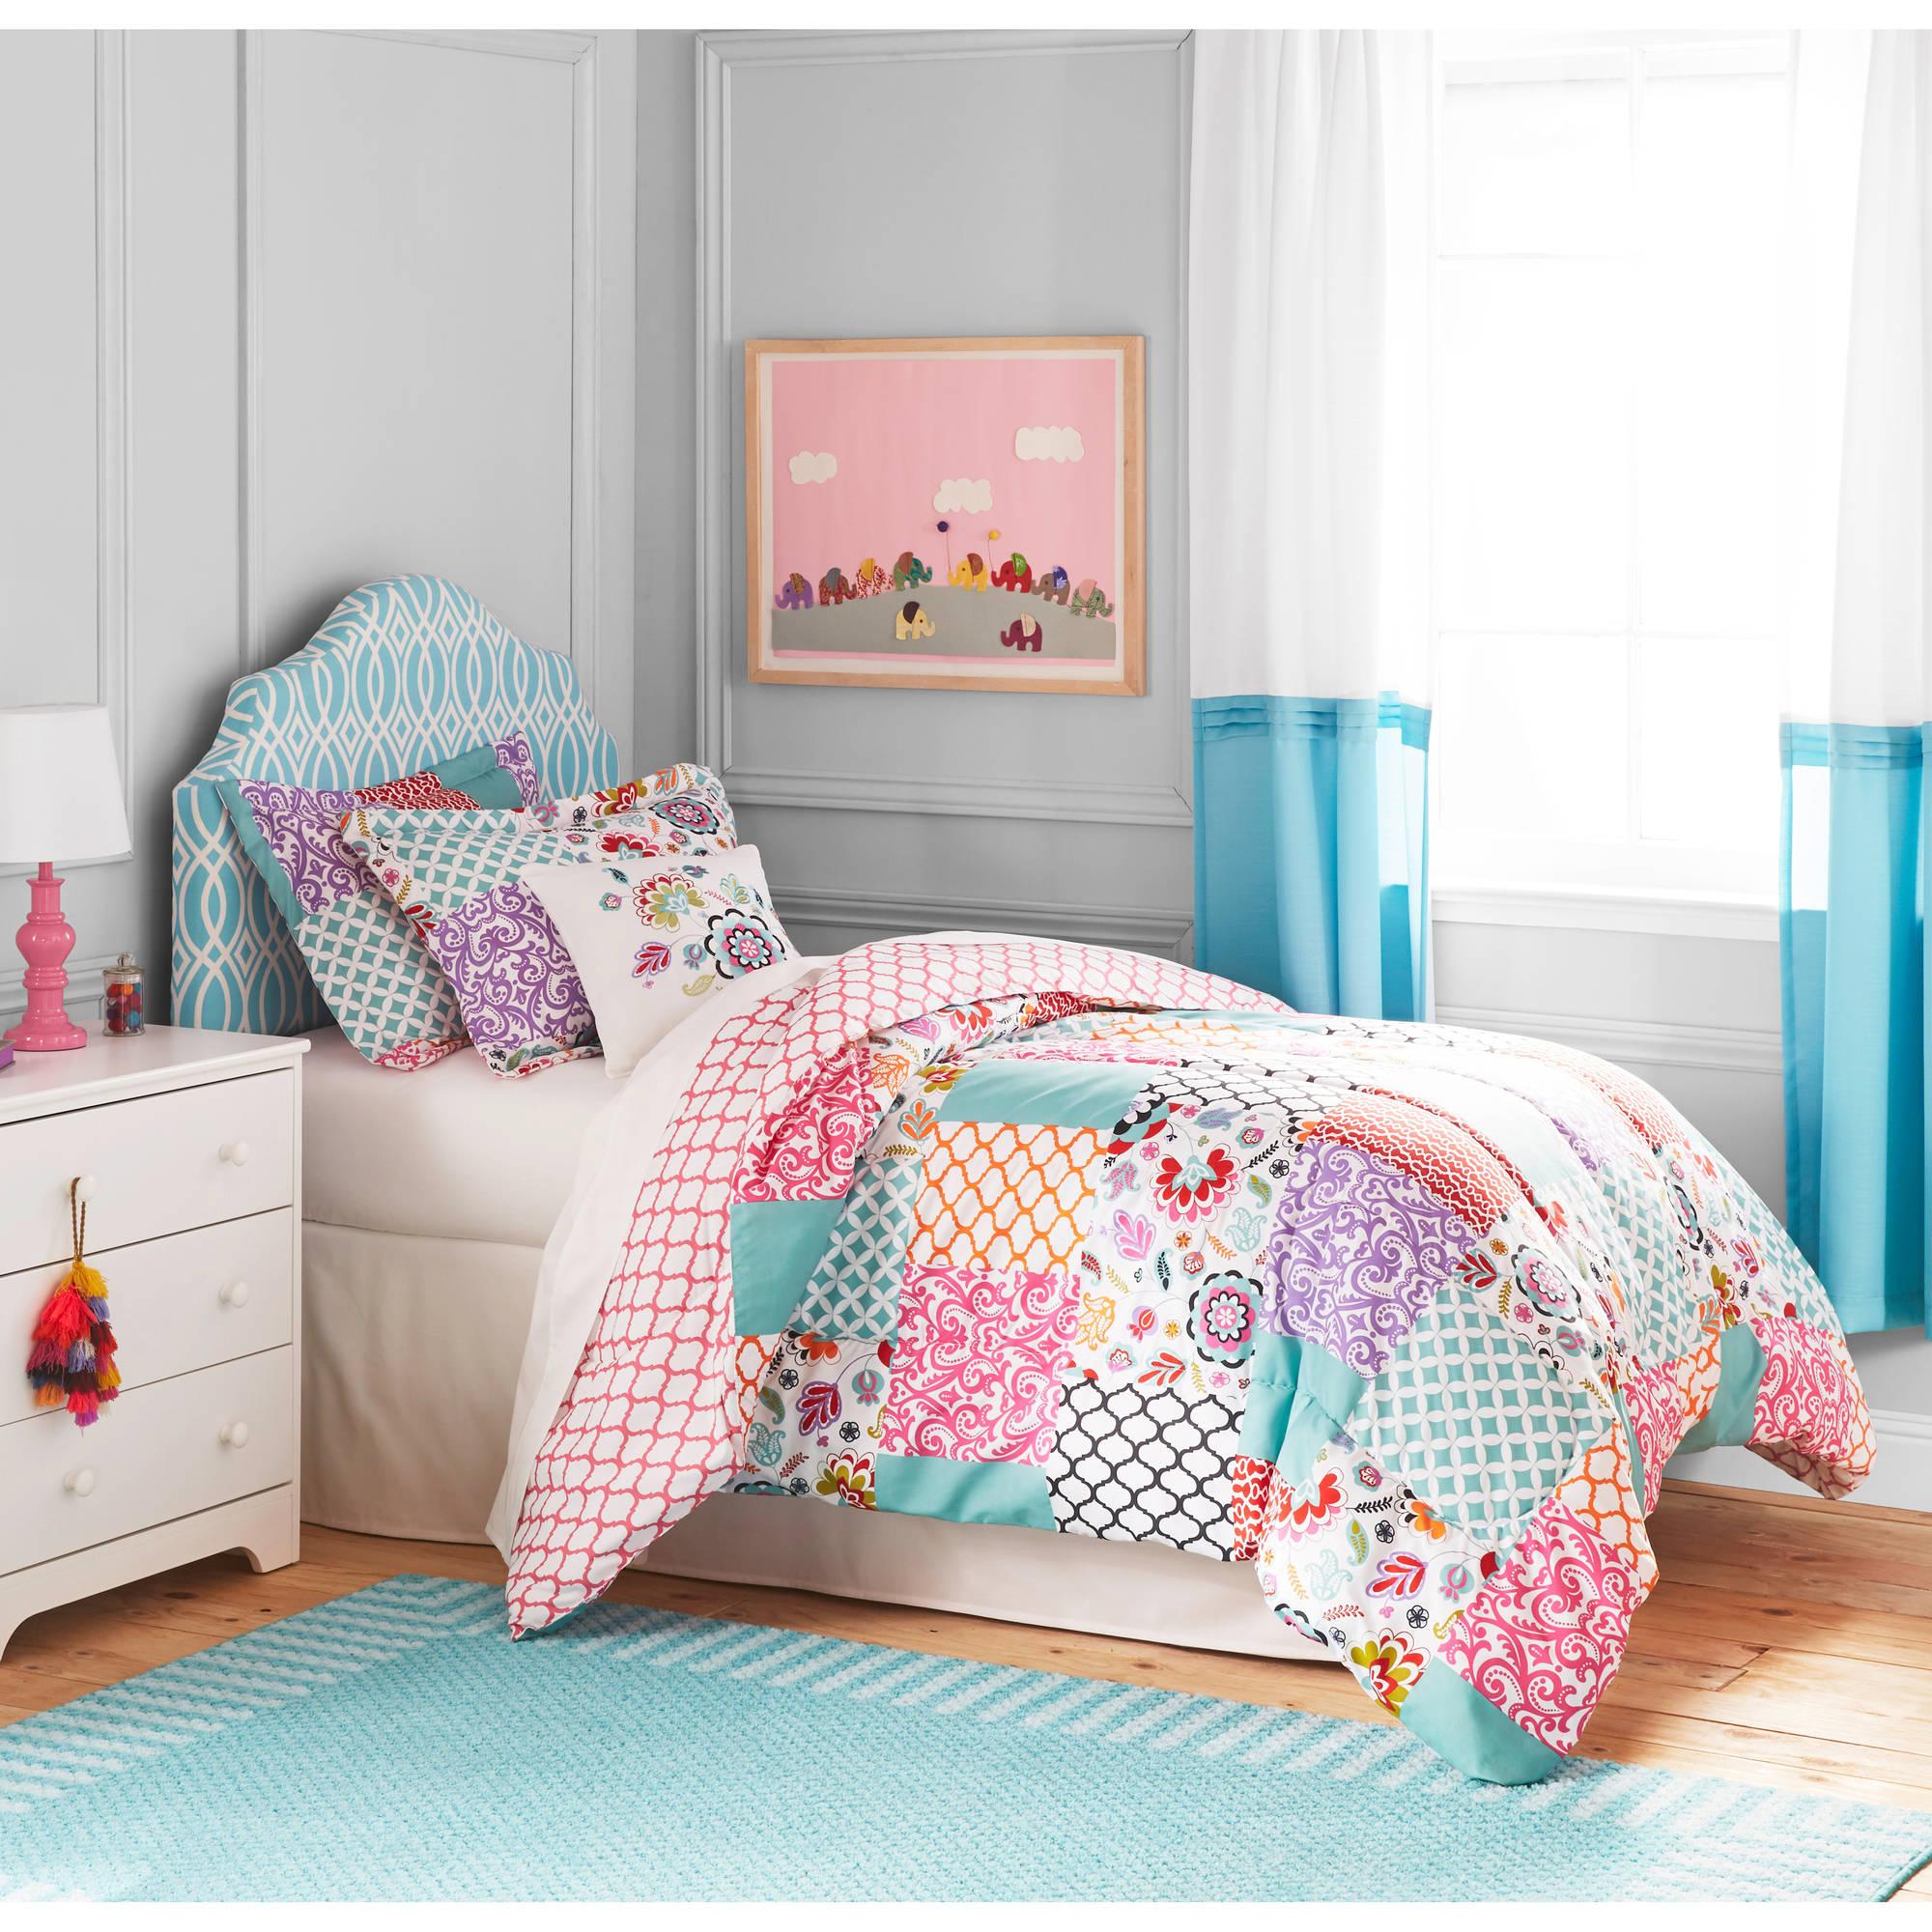 Children's Bedding Better Home and Garden Children's Boho Patchwork Bedding Duvet Set - VDEFXKN